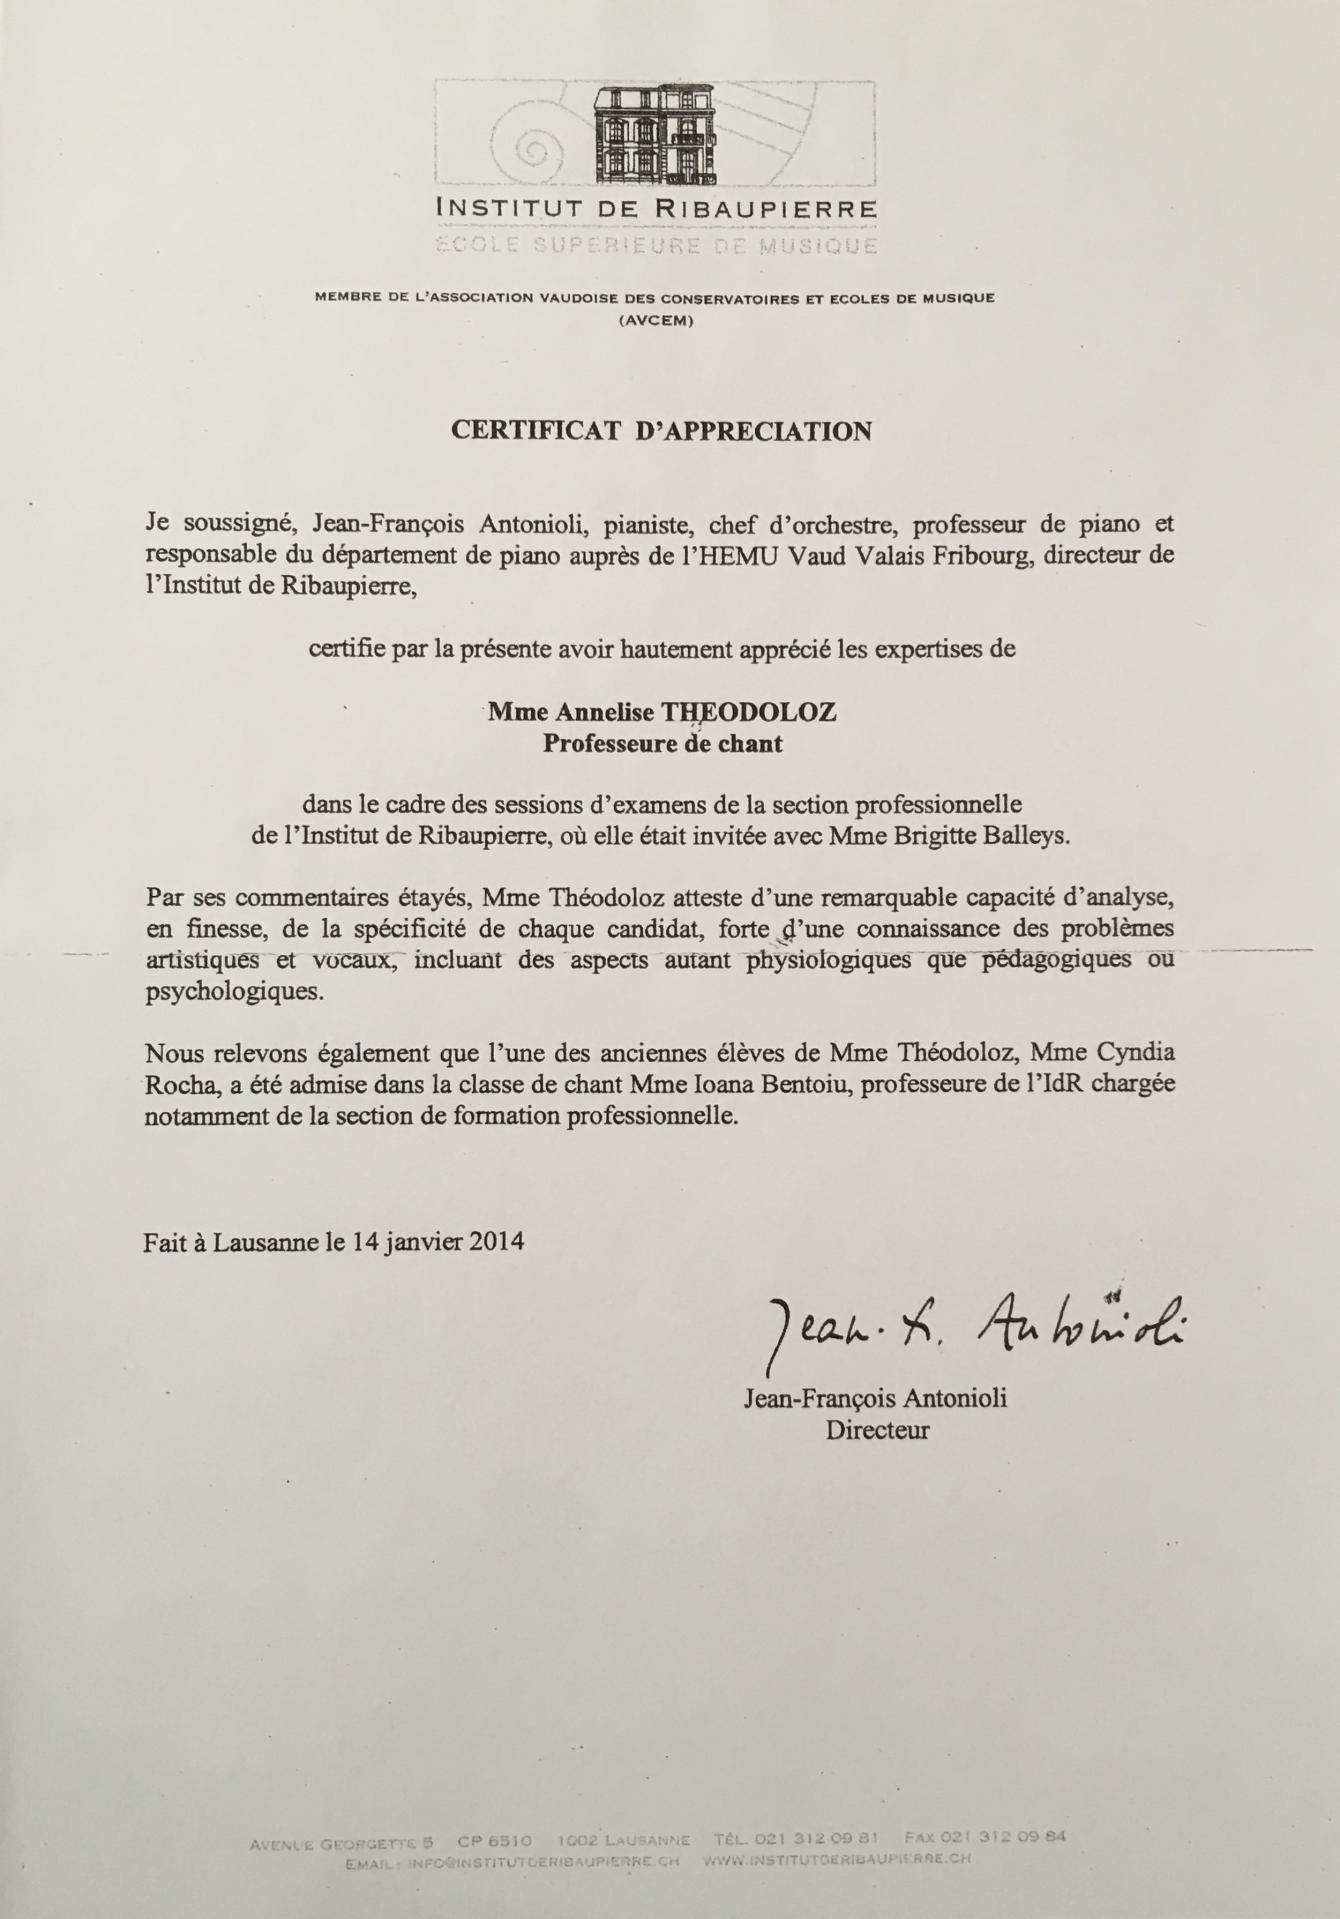 Certificat d'appréciation de M. Jean-François Antonioli